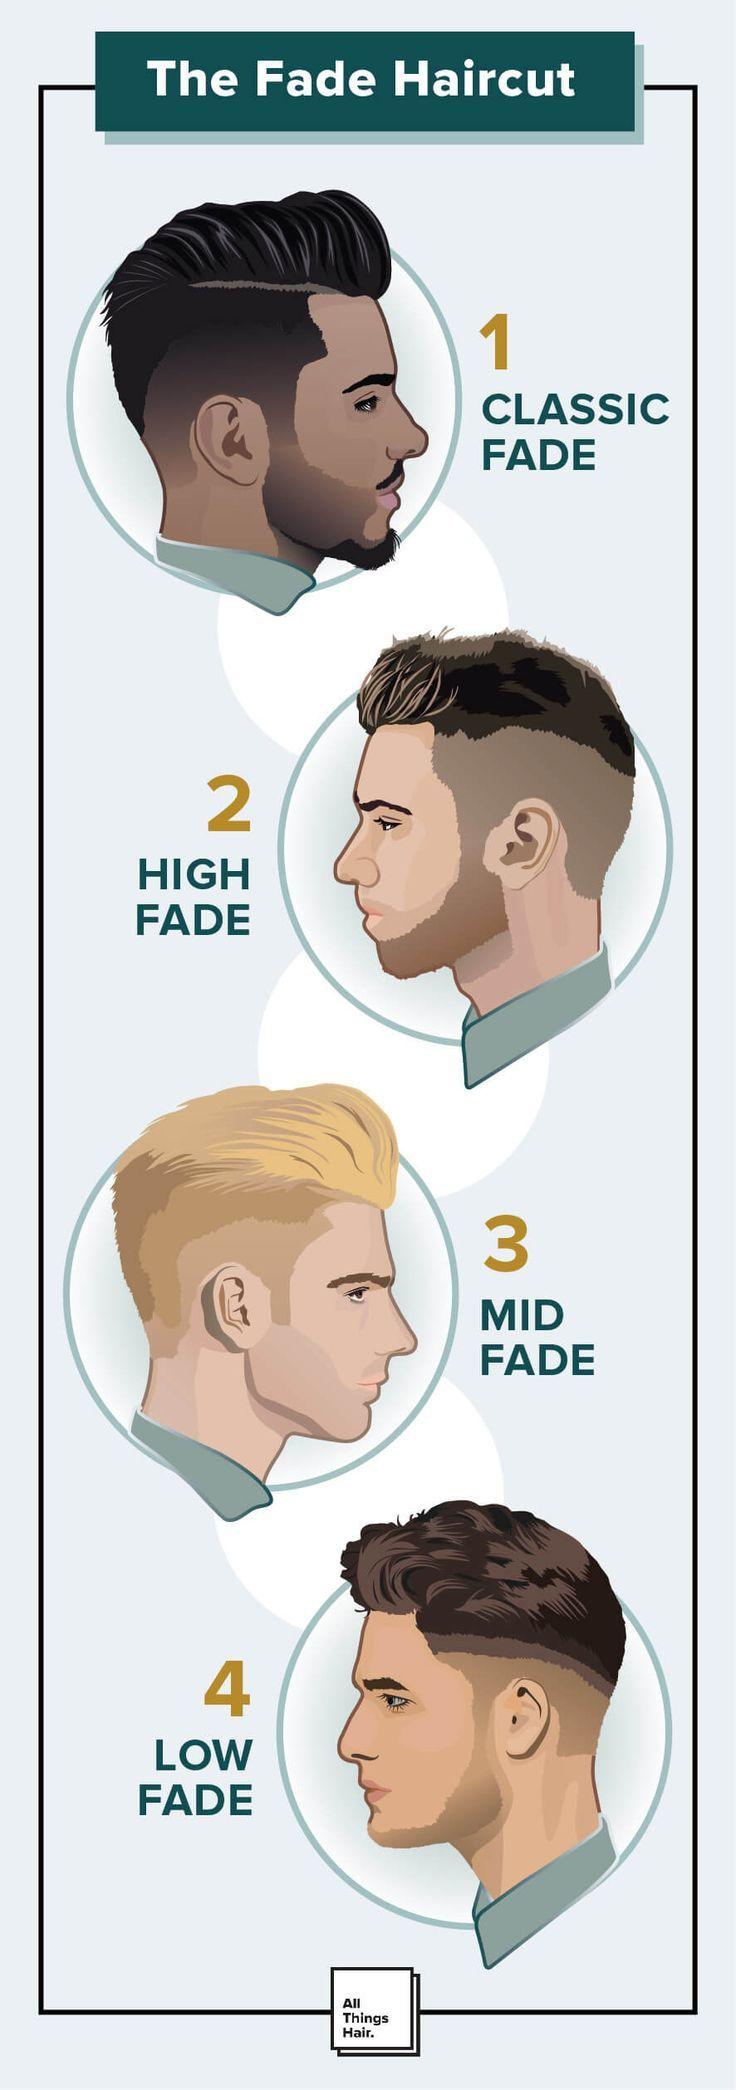 Ultra sun boy haircuts  best erkek giyim sitil images on pinterest  guy fashion man